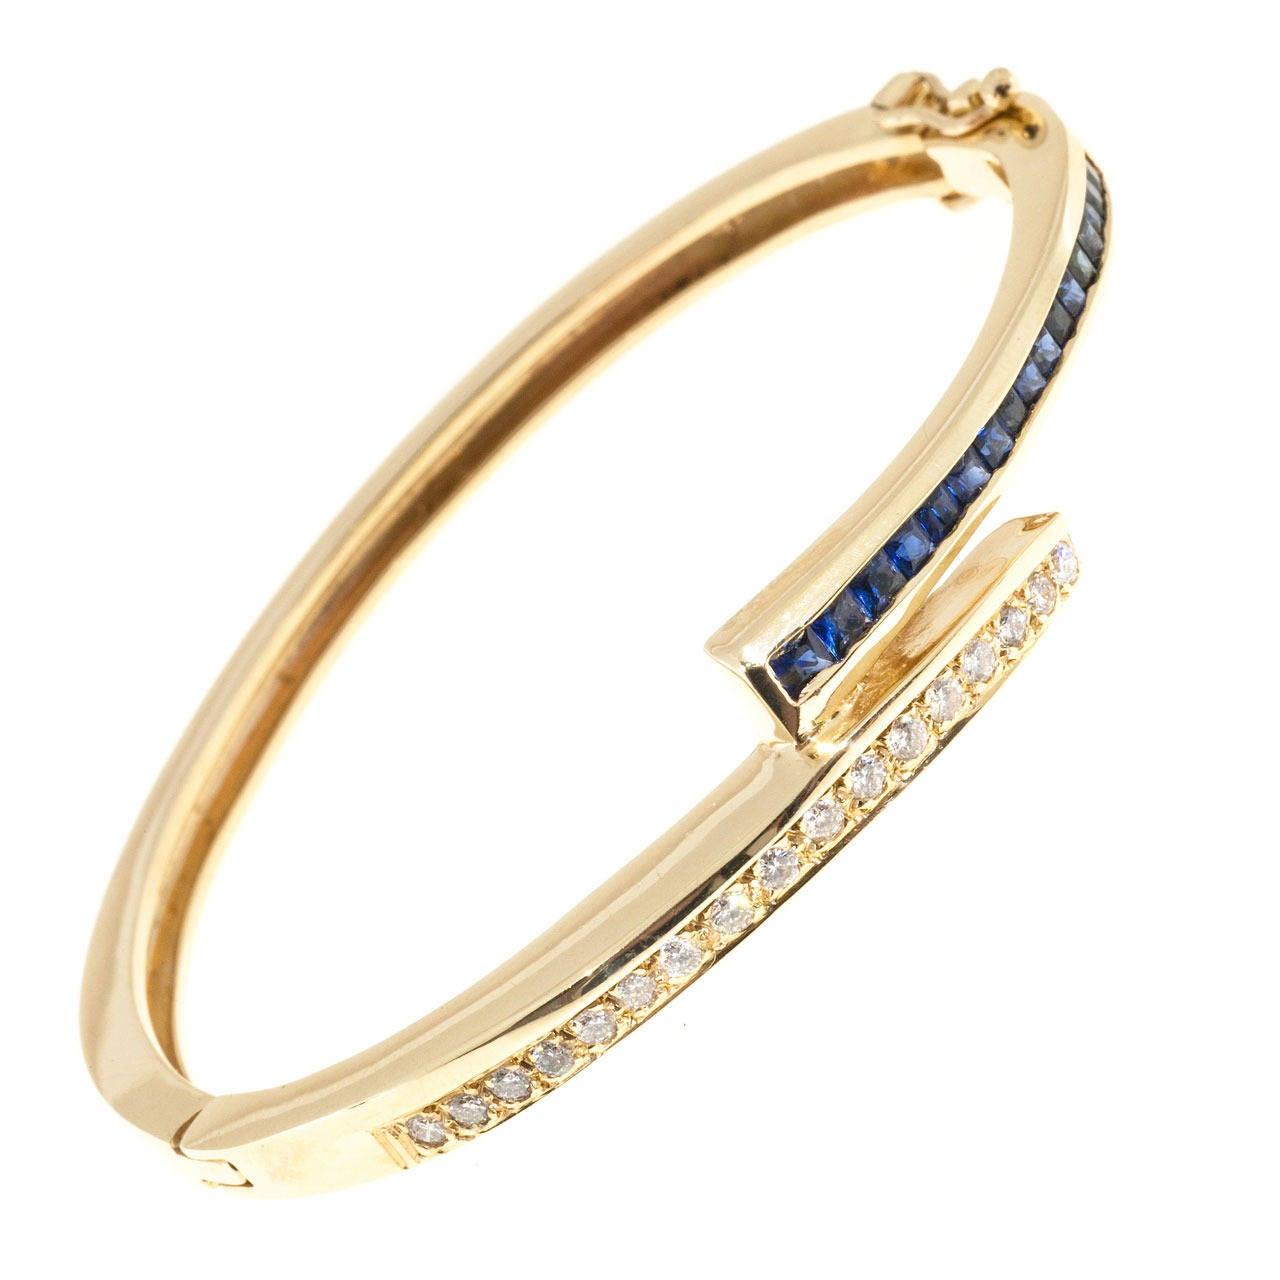 Square Sapphire Diamond Gold Bangle Bracelet